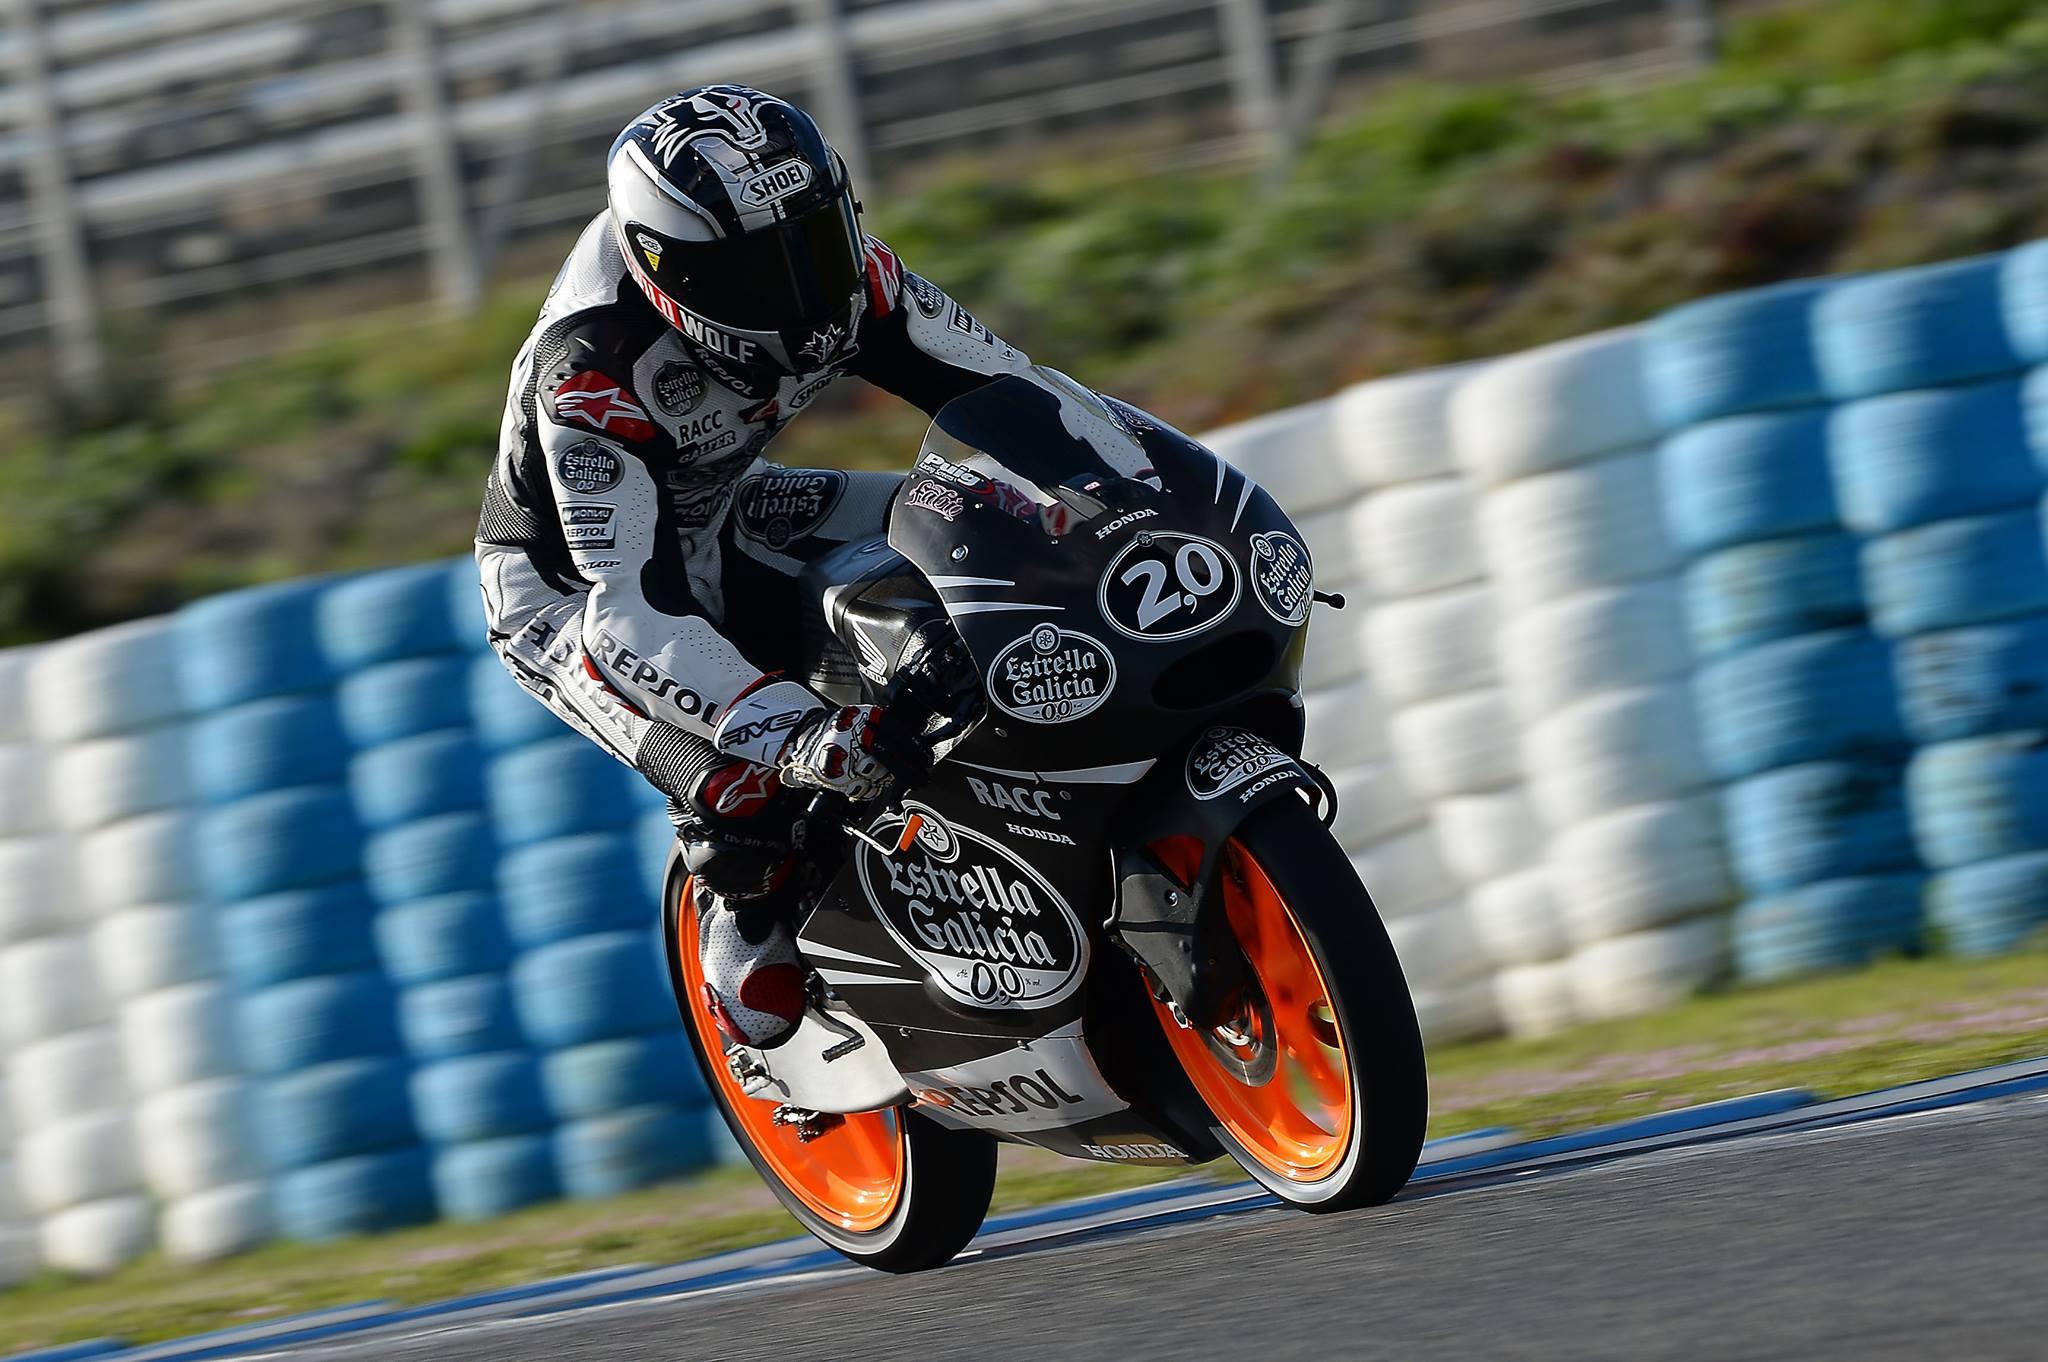 Fabio Quartararo, Champion en titre, lors du test IRTA Moto3 à Jerez en mars dernier. (Photo : Fabio Quartararo)